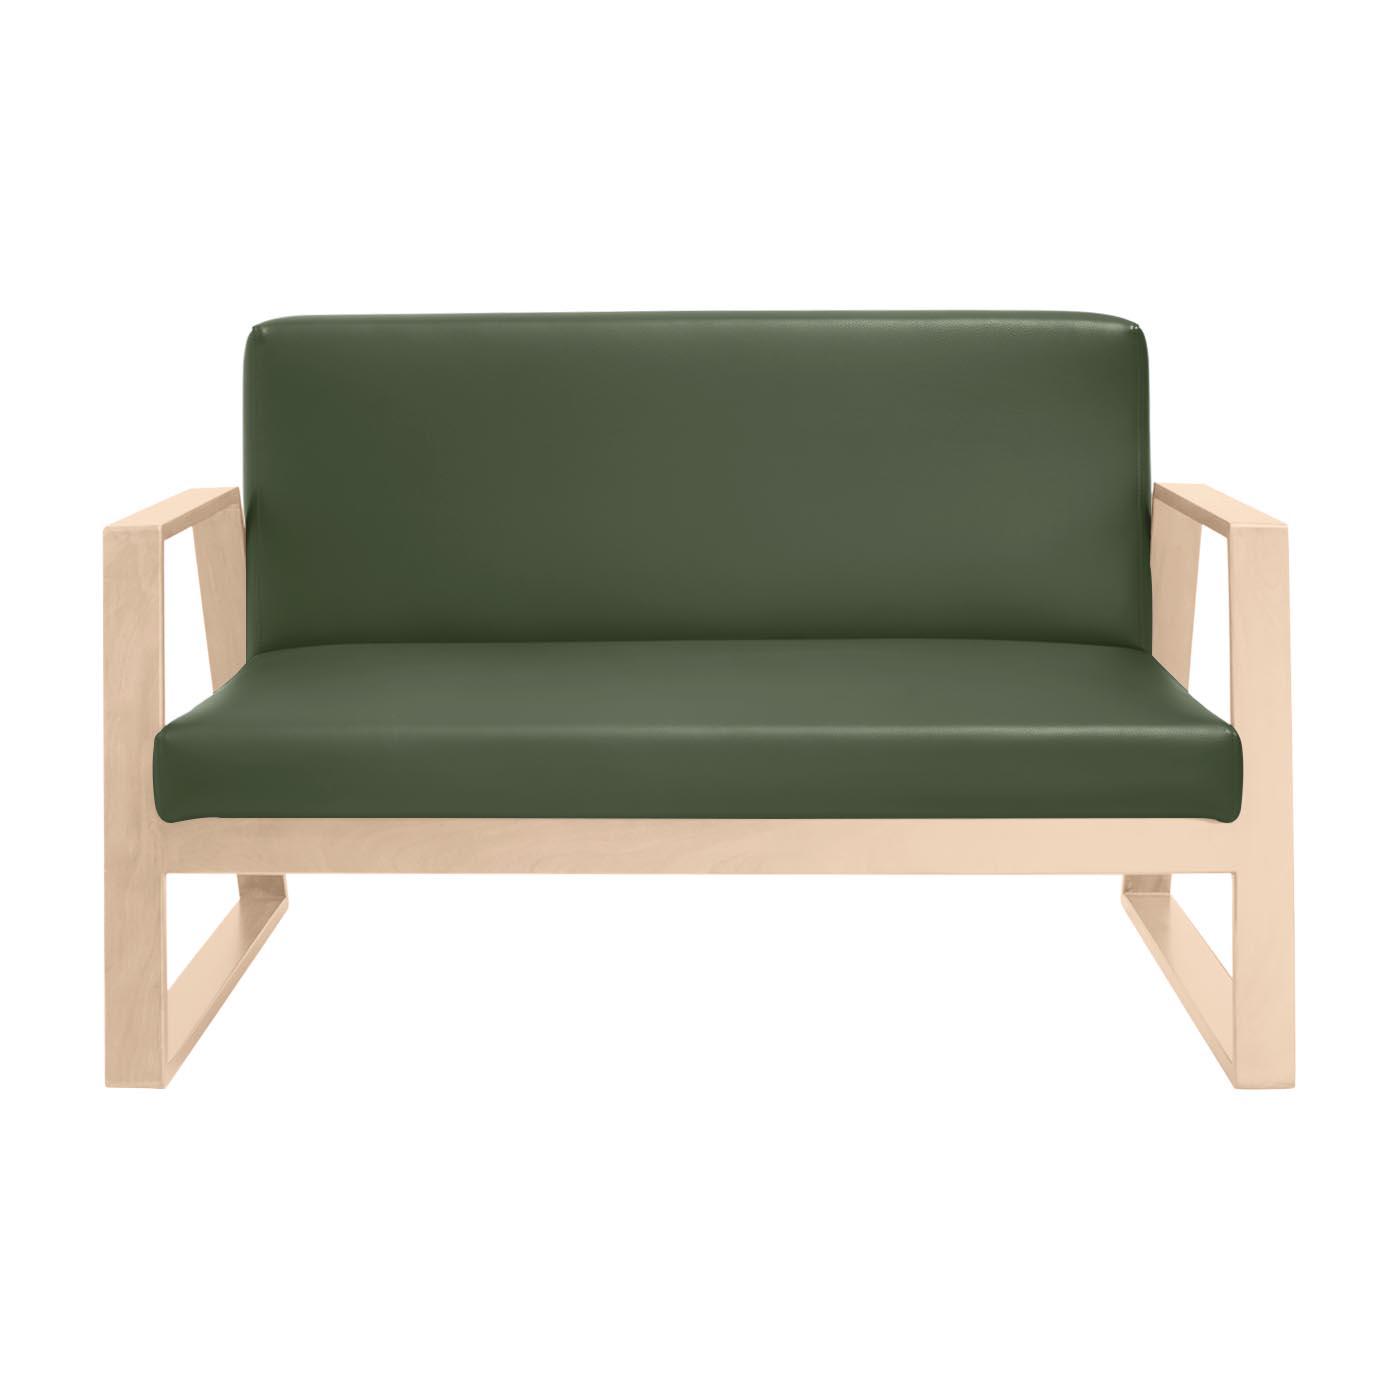 Mukō Green Light Double Sofa